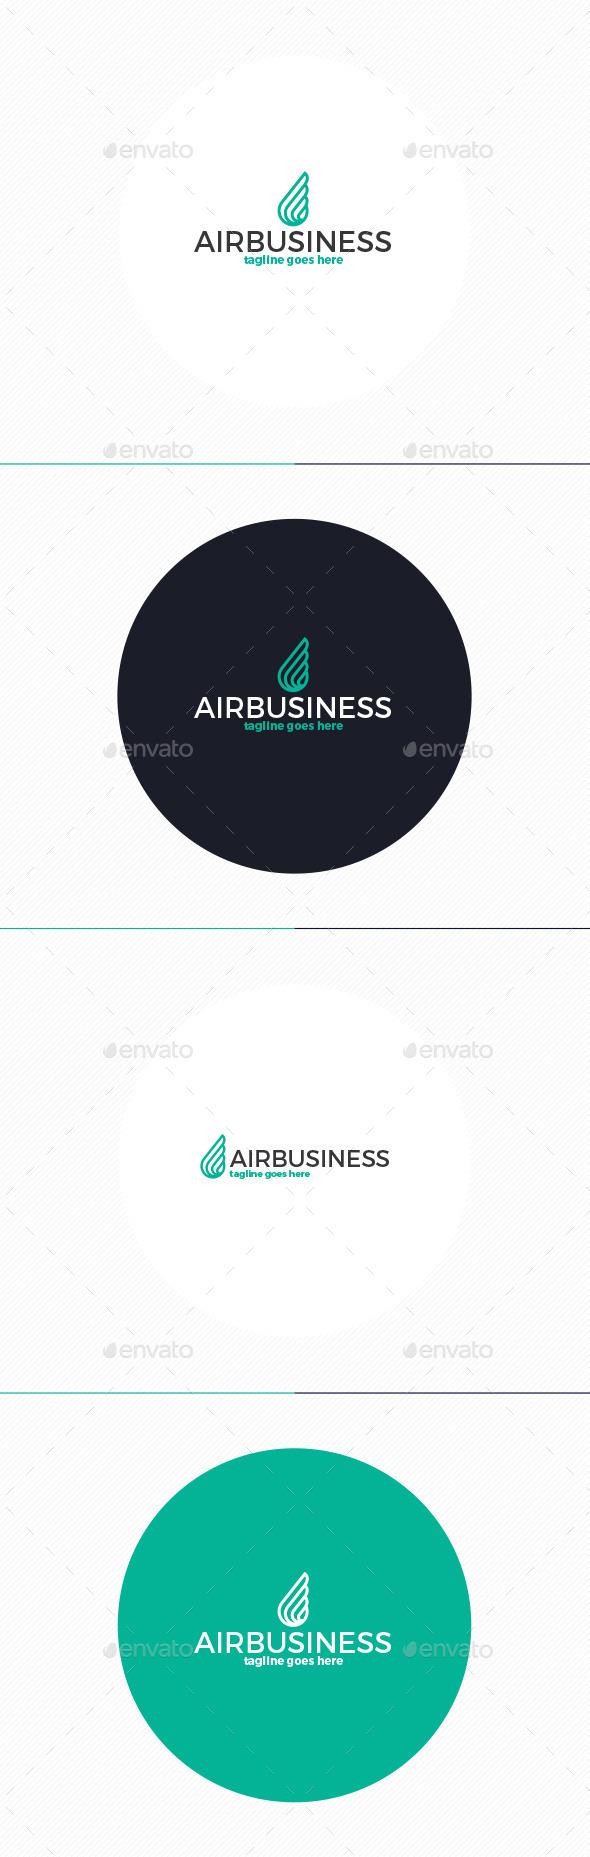 Air Business Logo - Vector Abstract